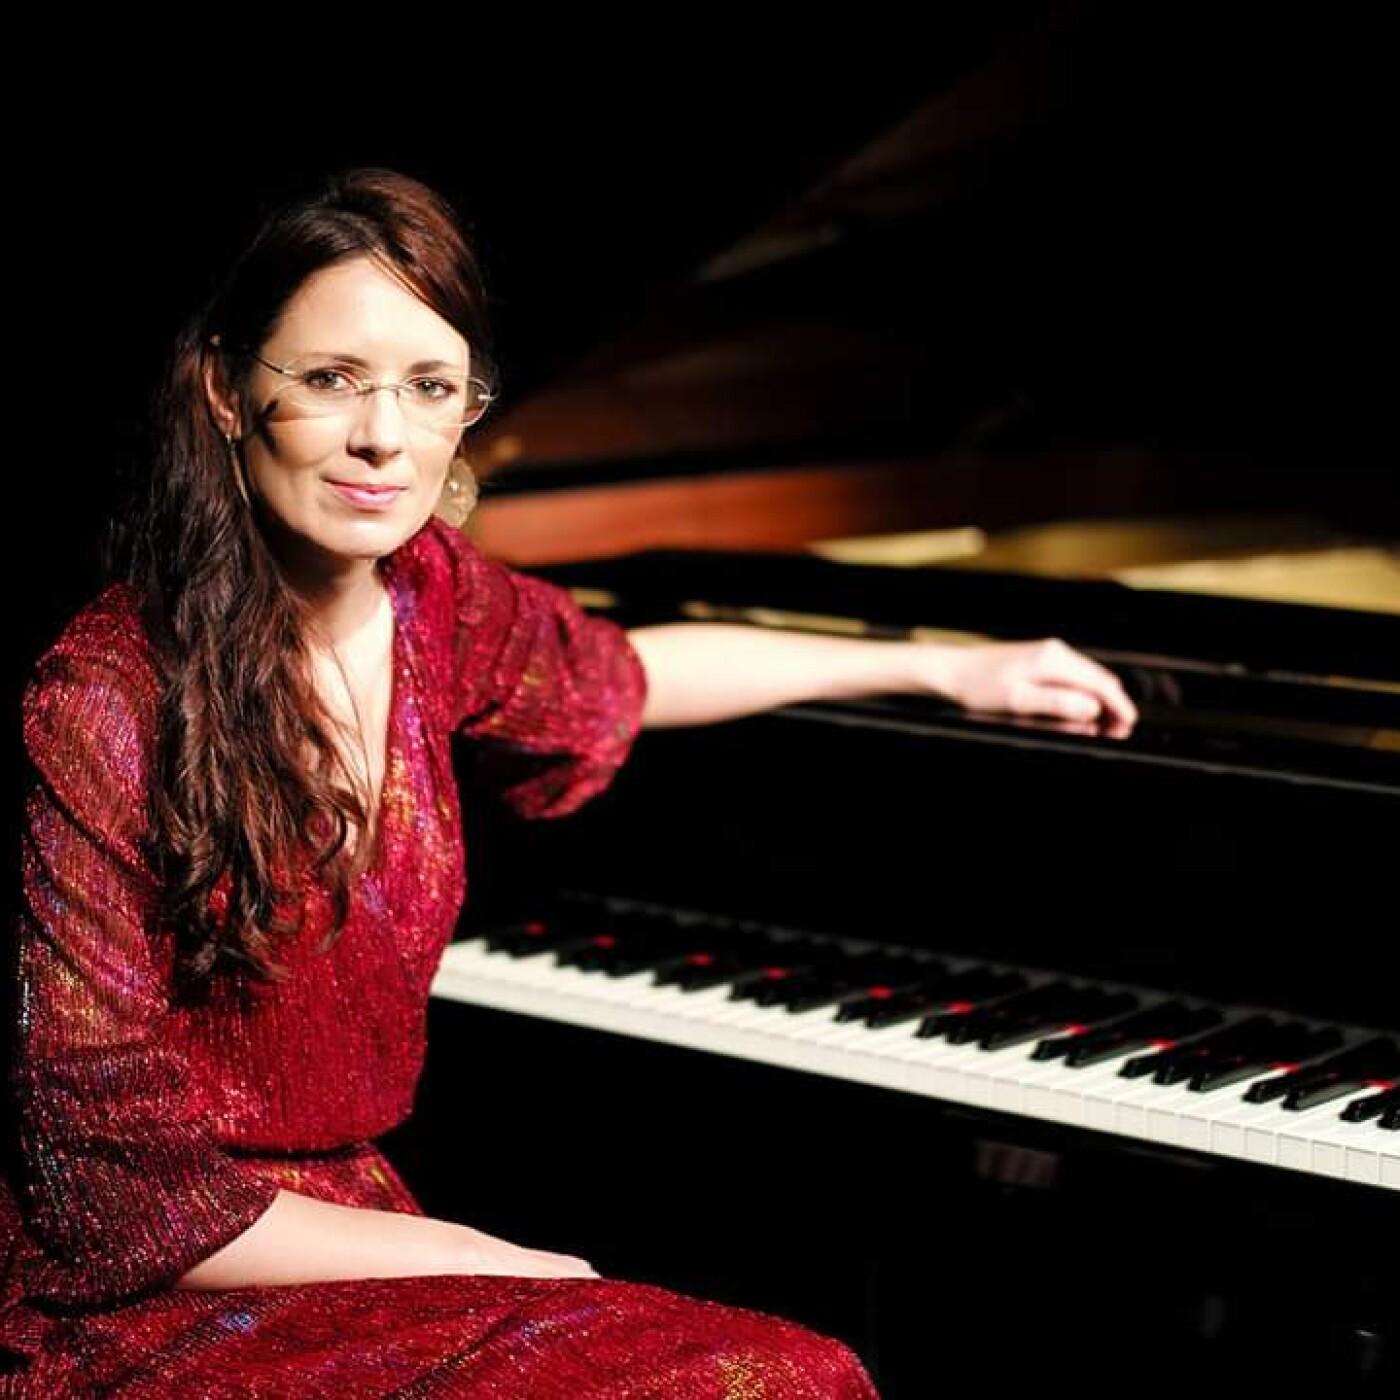 Myriam Barbaux Cohen est pianiste à Frankfurt, Allemagne - 15 07 2021 - StereoChic Radio